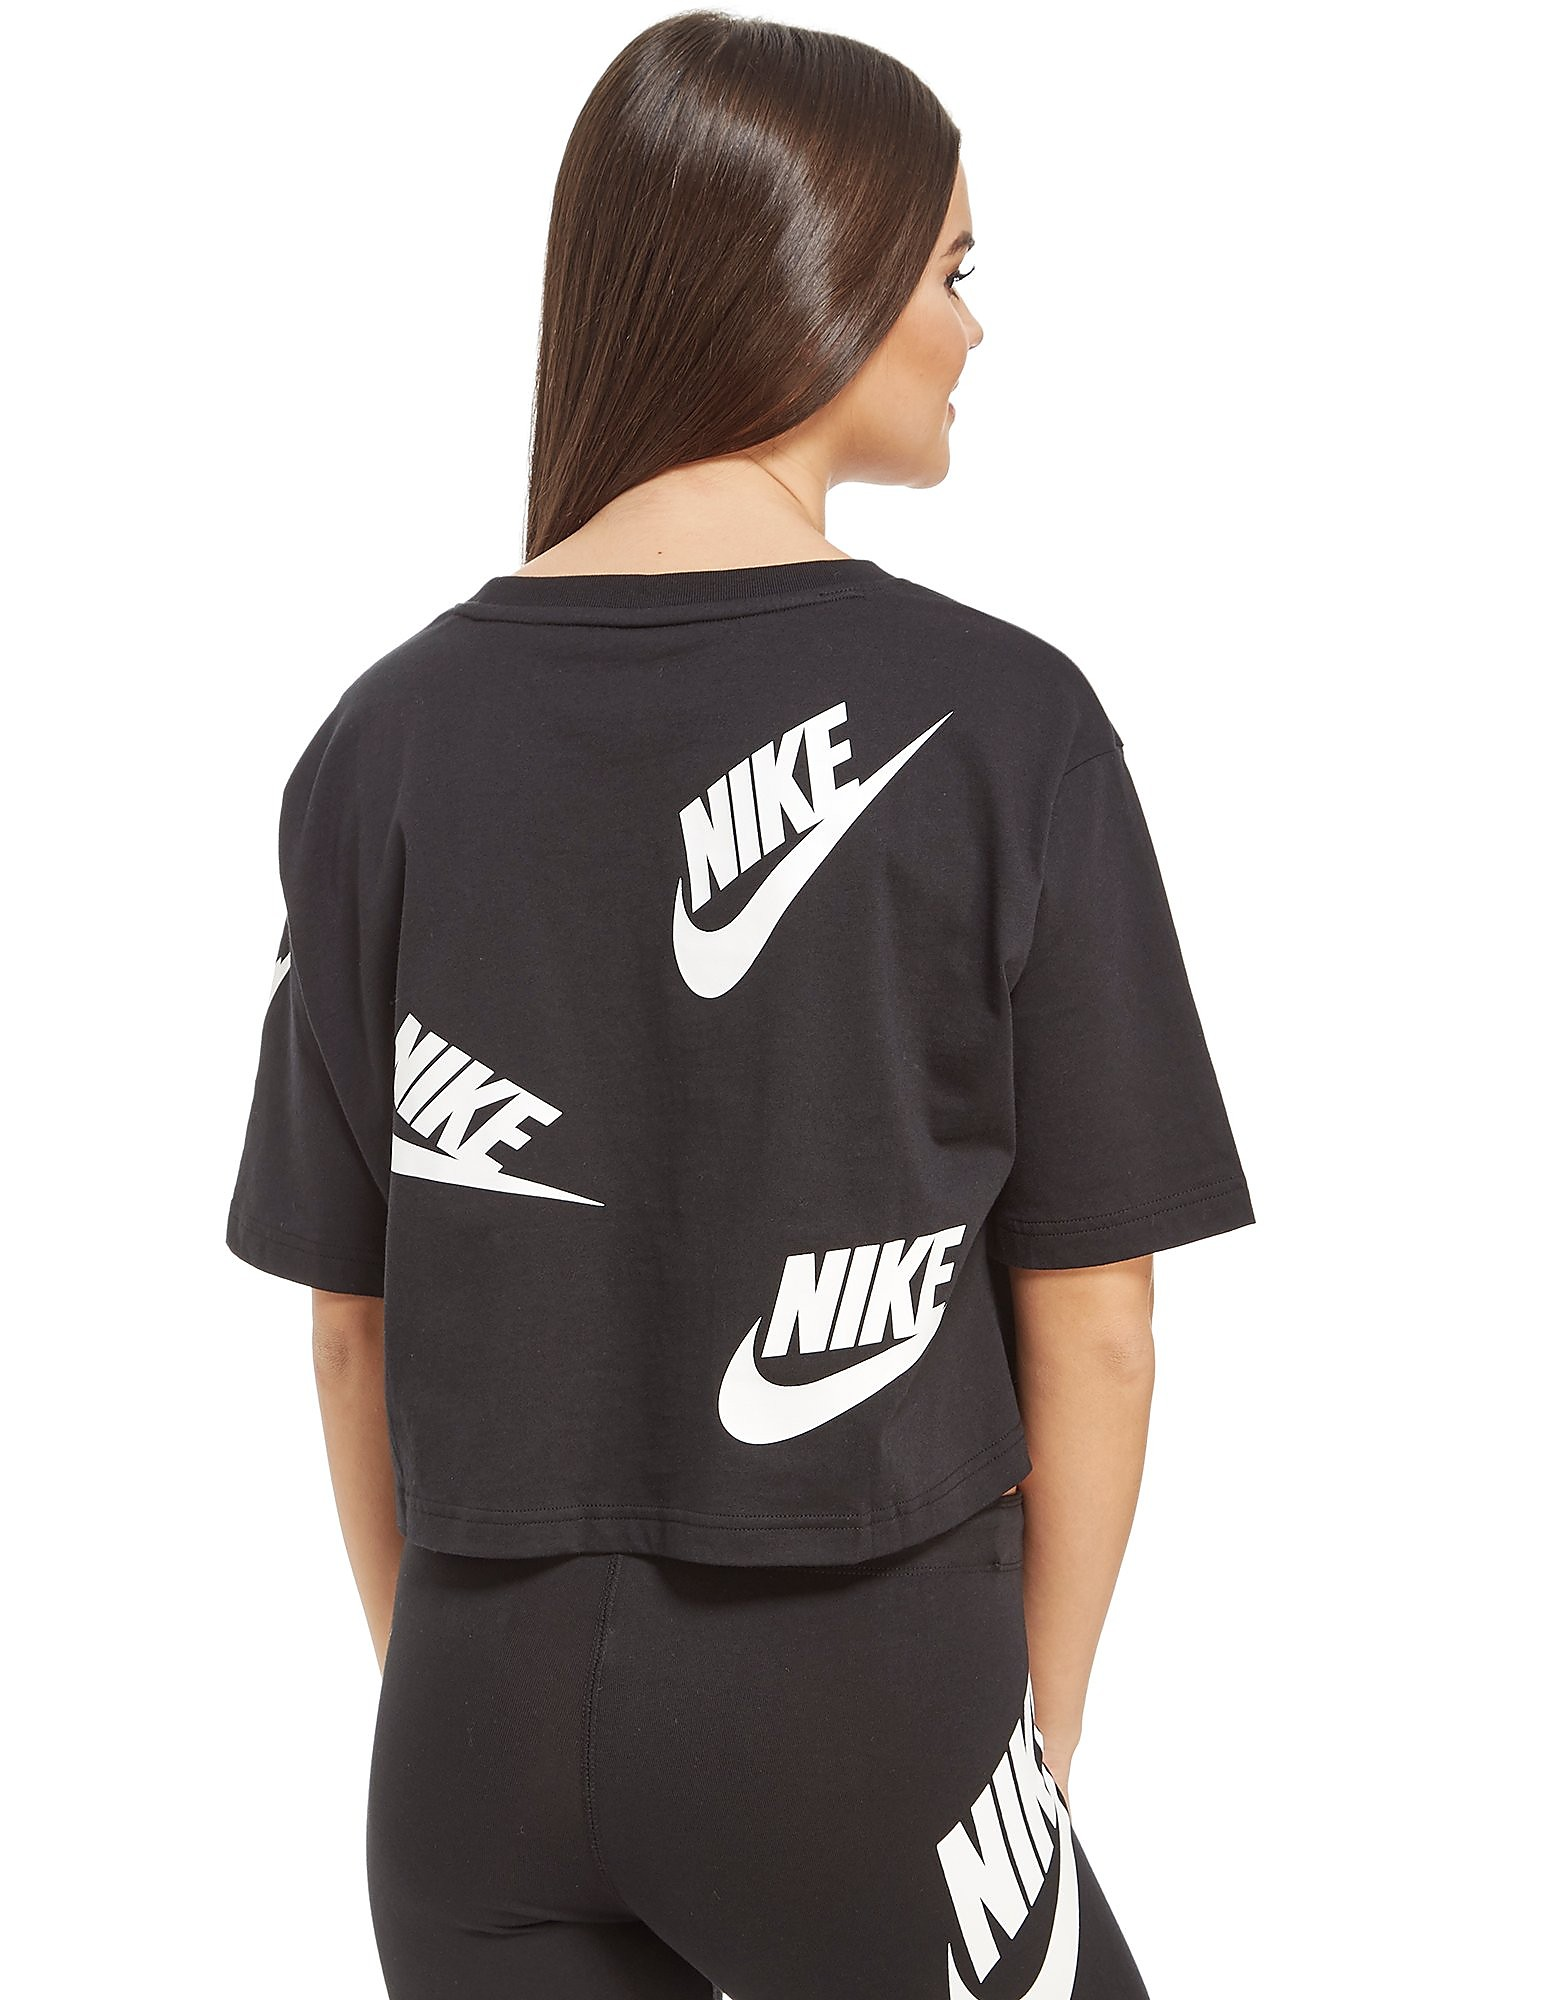 Nike All Over Print Futura Crop T-Shirt